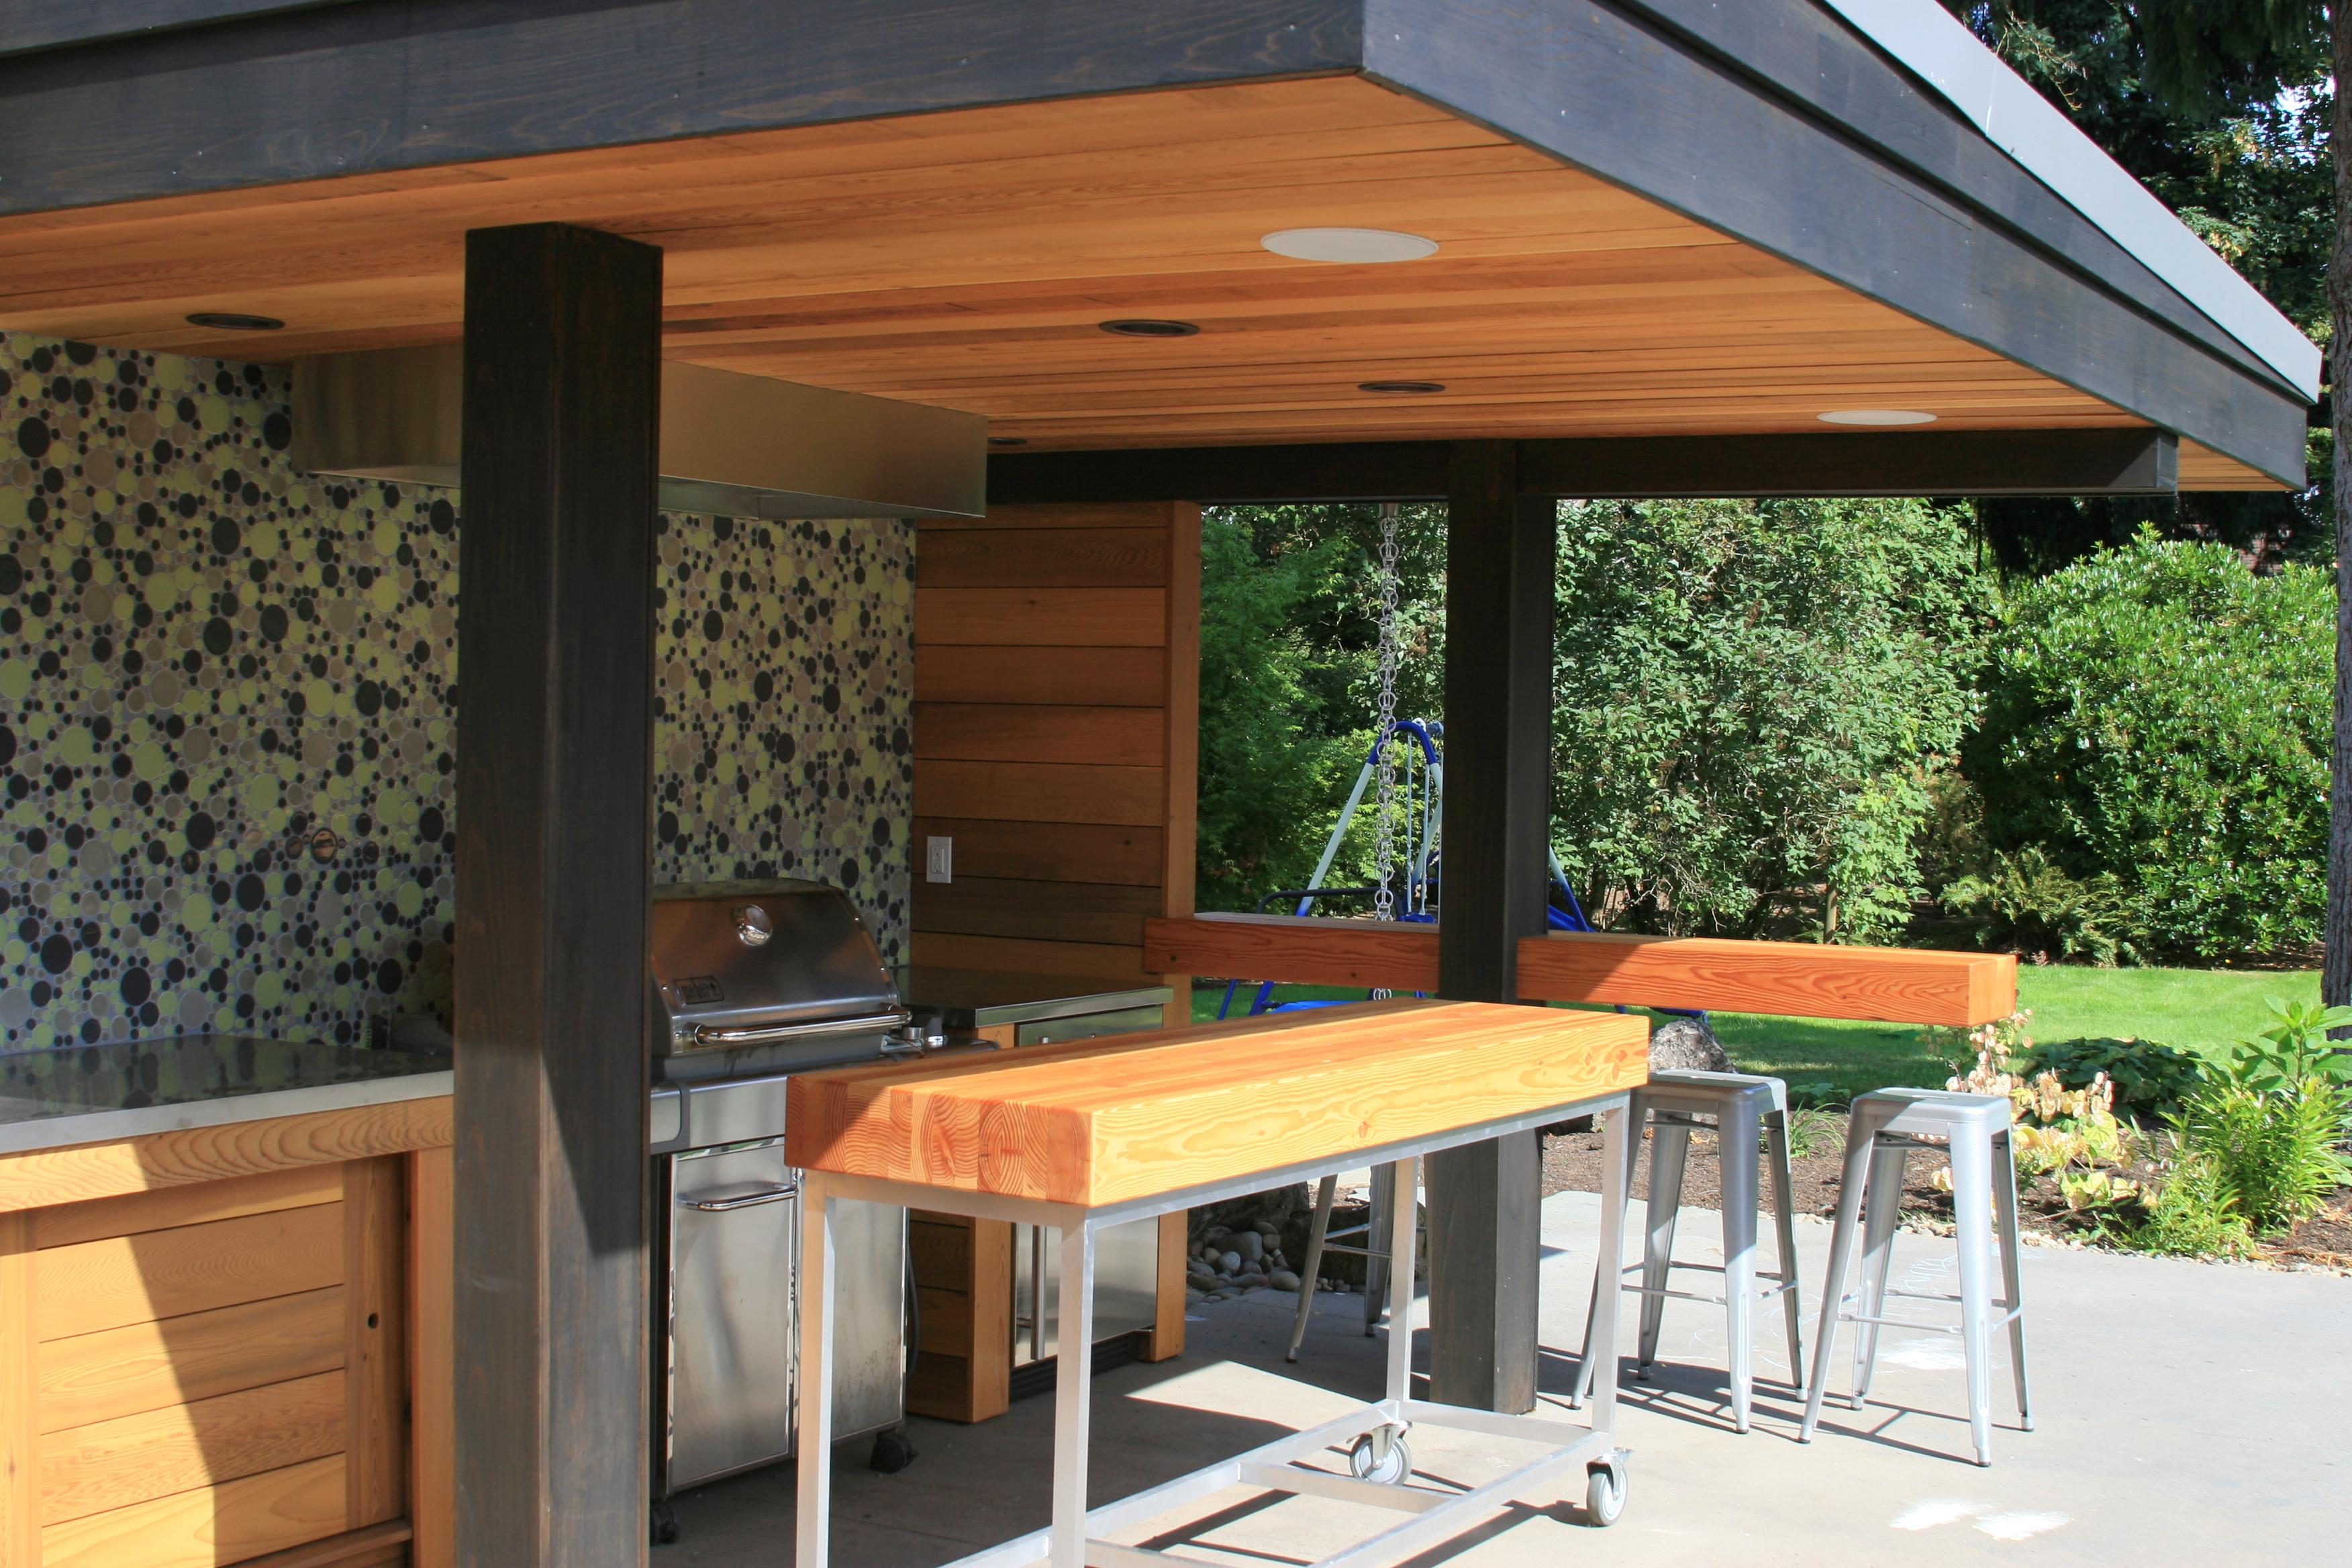 outdoor kitchen and bar modern rugs 2013 june inside arciform